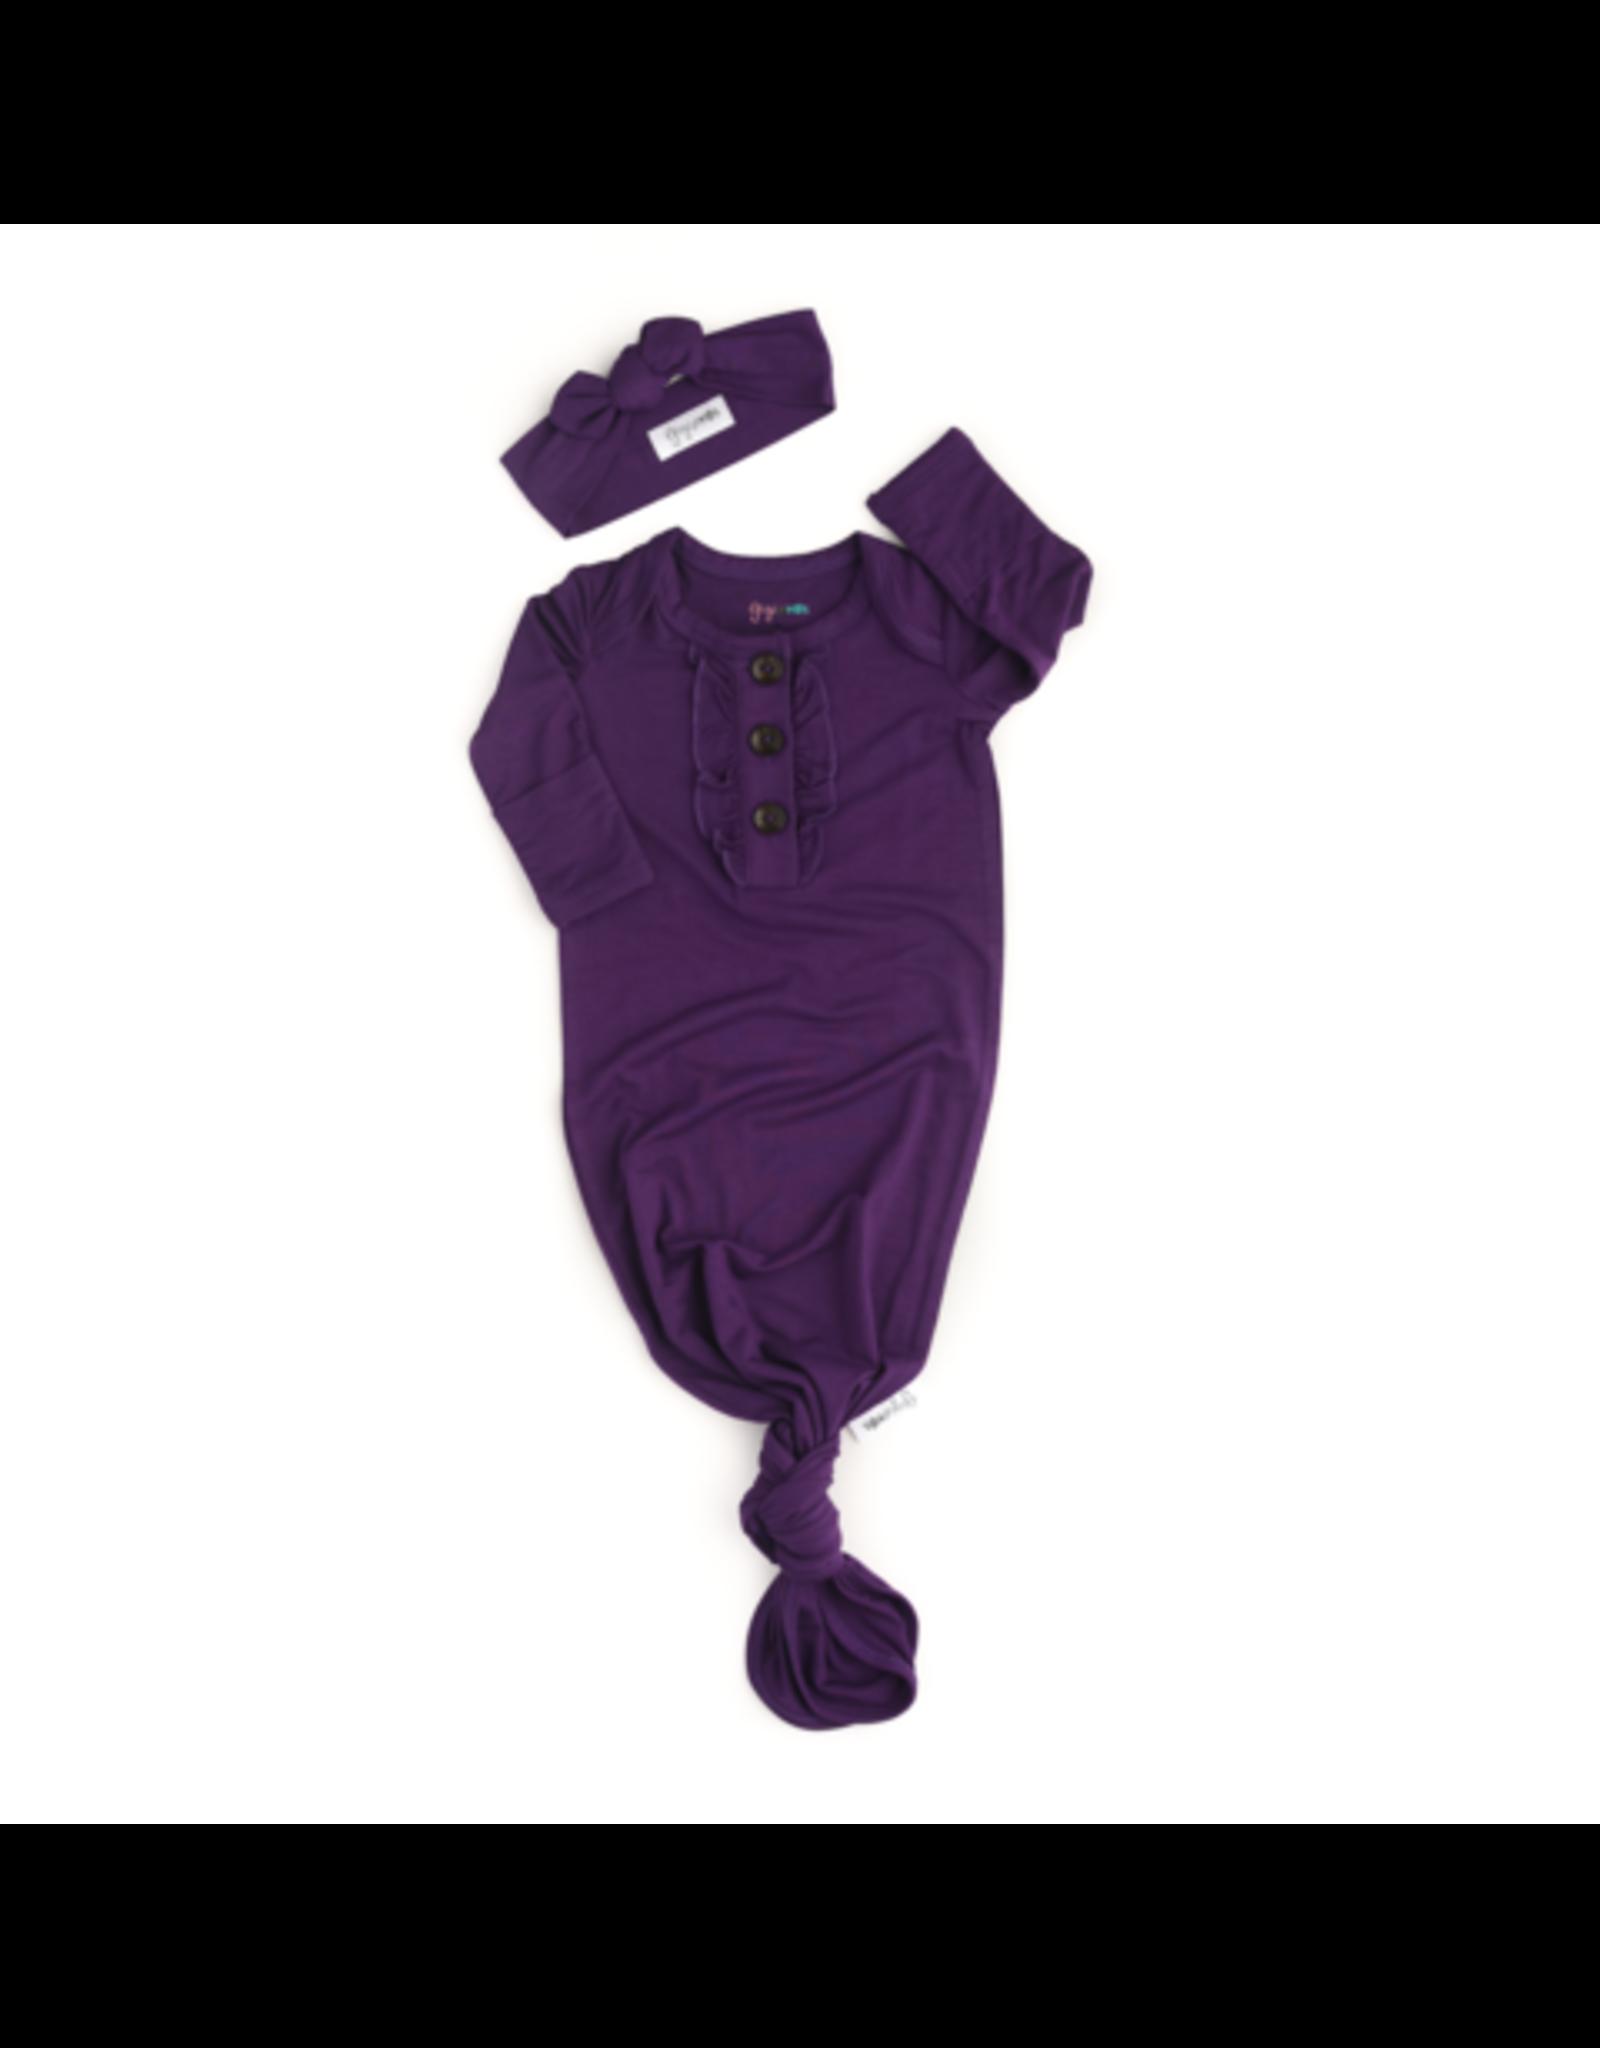 Gigi & Max Gigi & Max- Audrey Plum Ruffle Button Gown & Headband Set